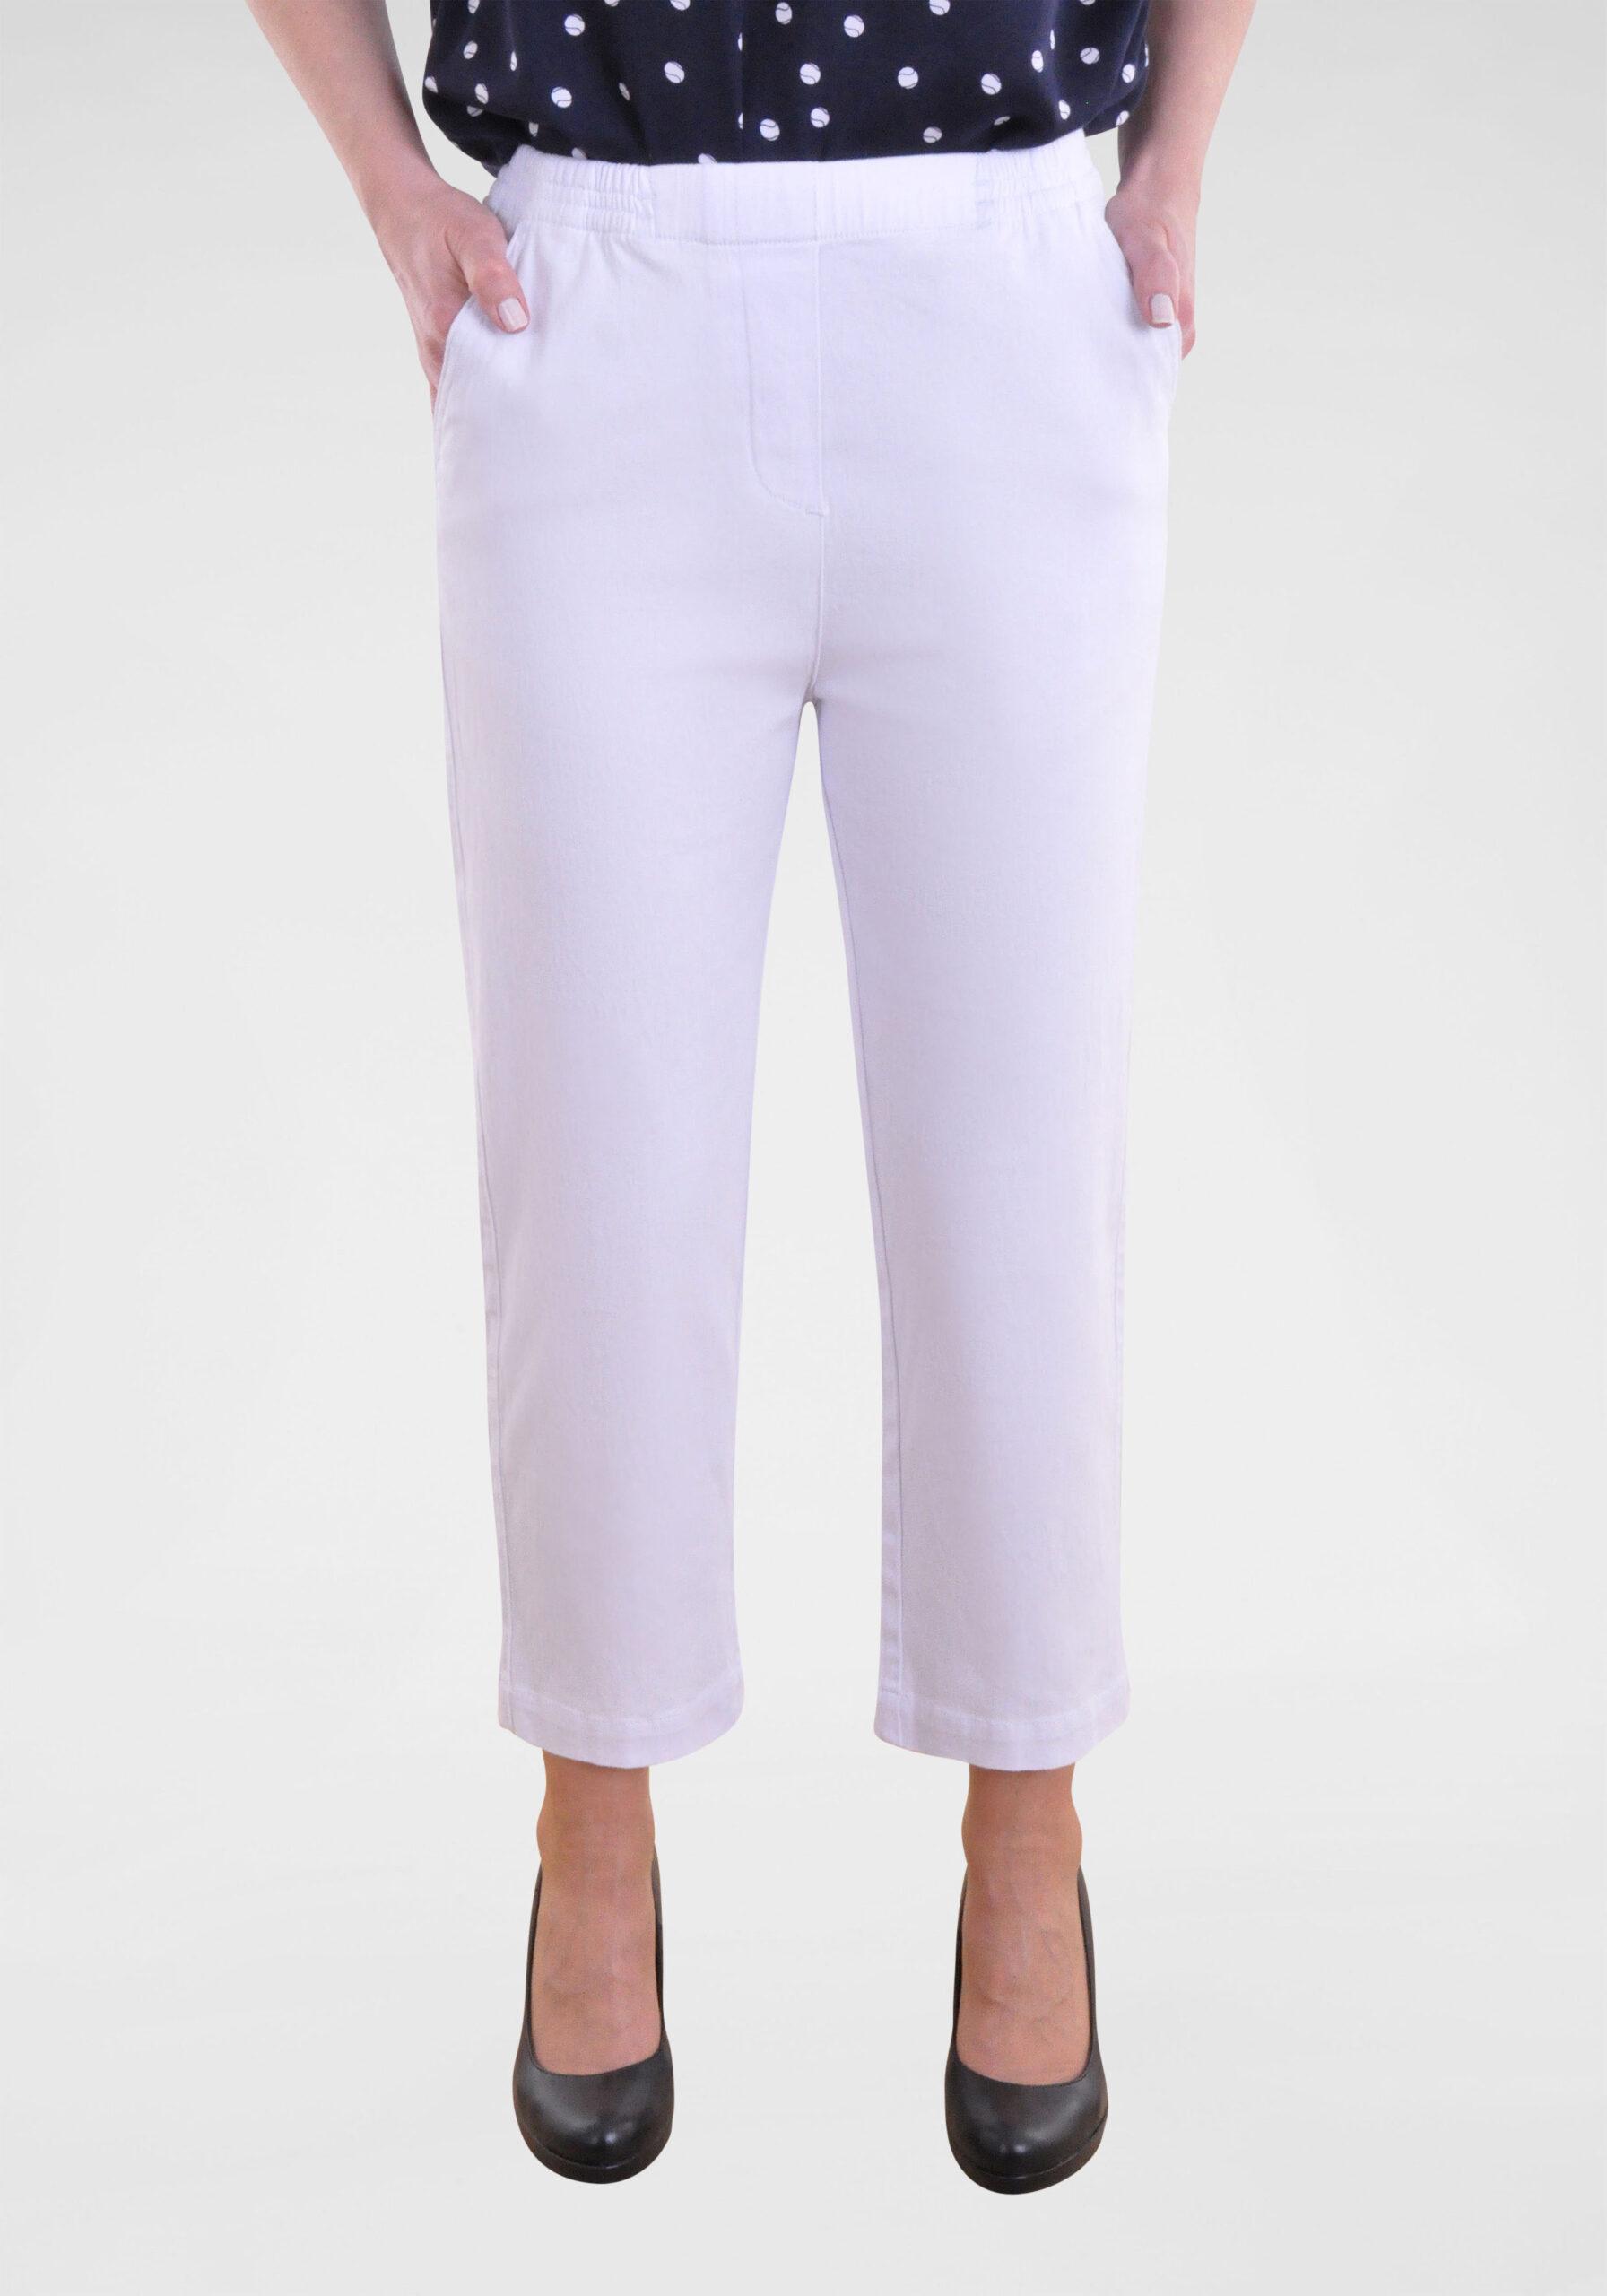 Damen Jeans in 7/8-Länge Weiß